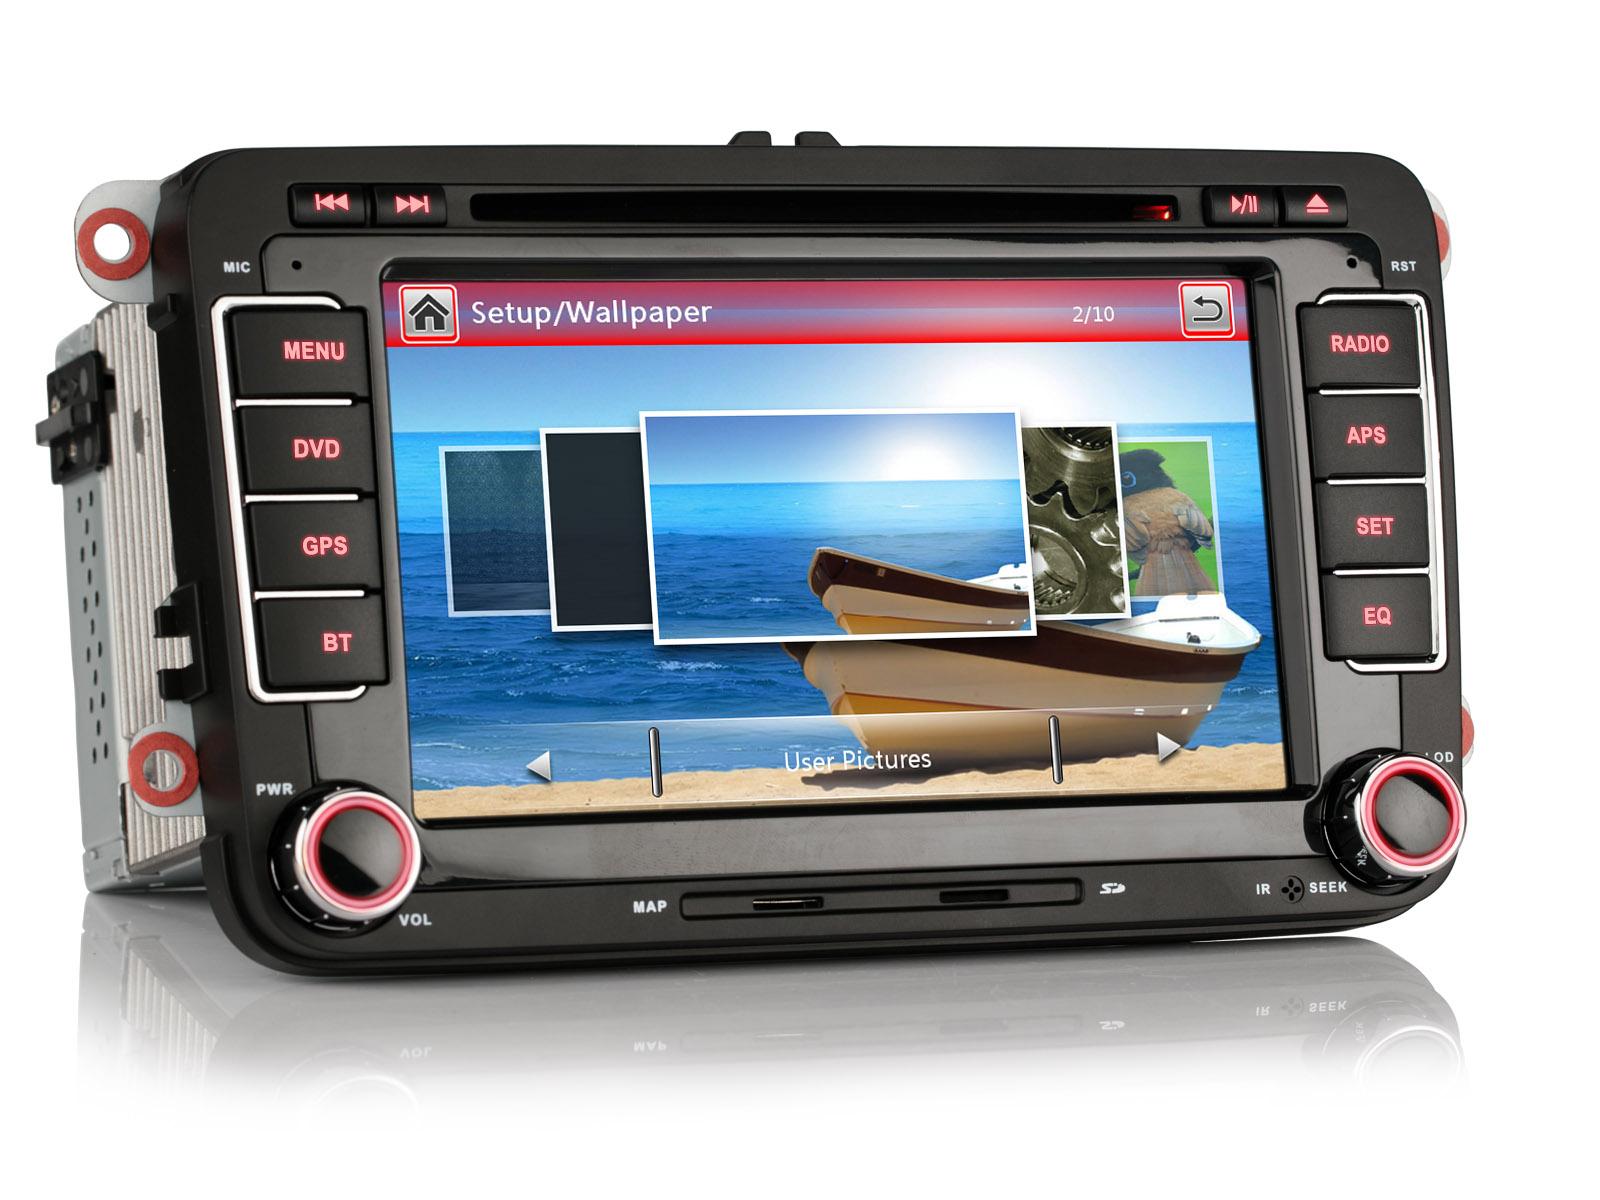 r ckfahrkamera 7 gps autoradio navigation dvd f r vw. Black Bedroom Furniture Sets. Home Design Ideas